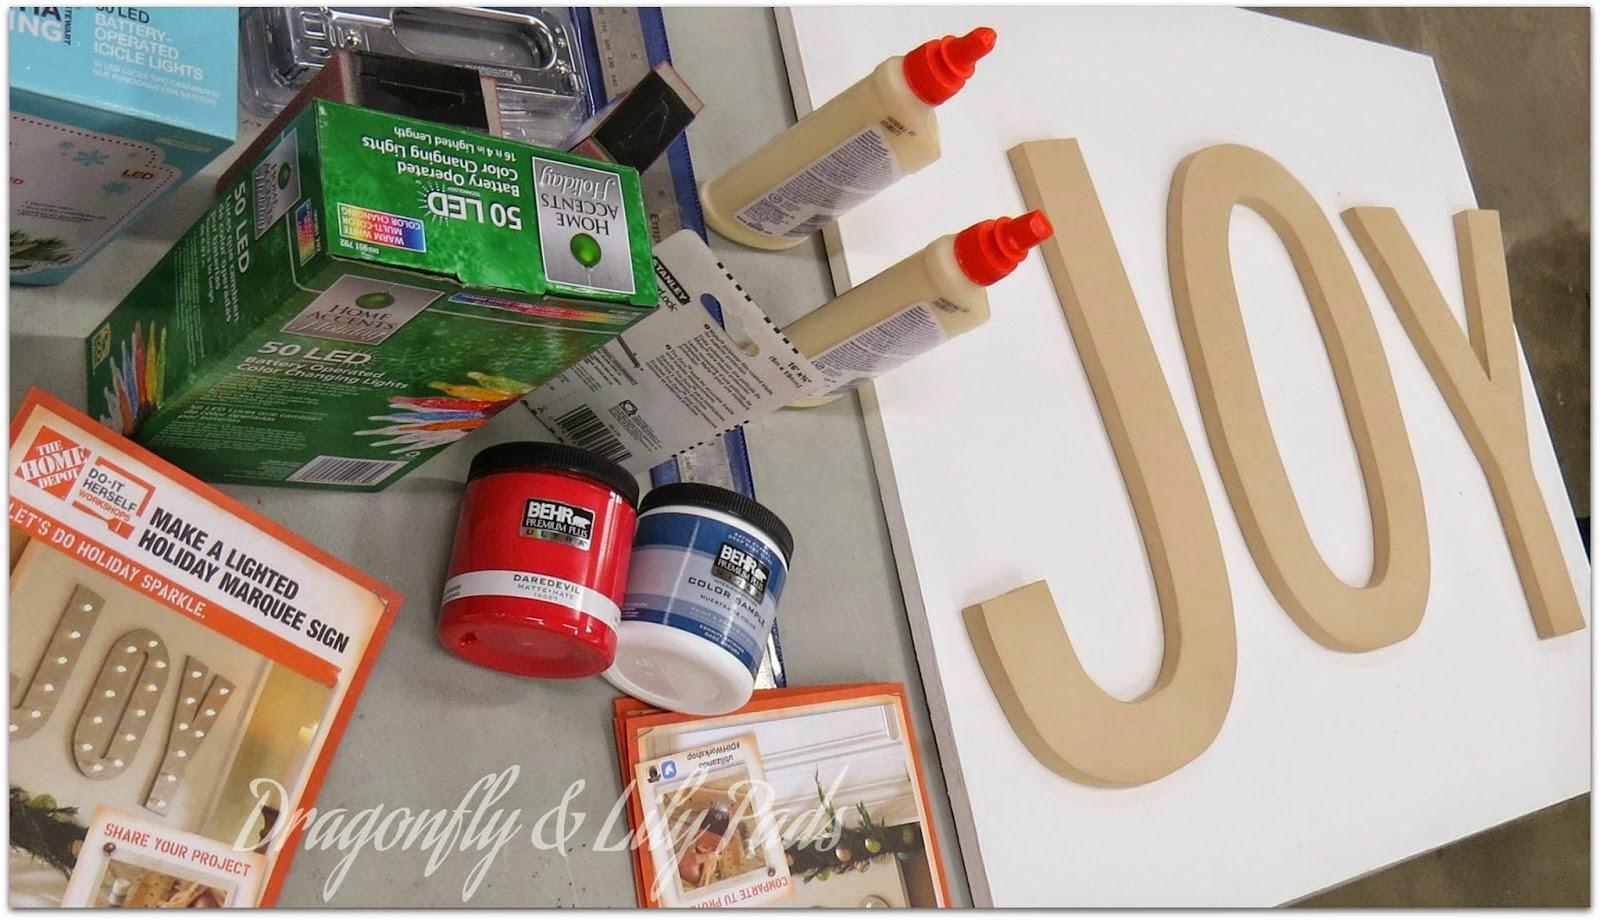 Letters, Joy, Home Depot Do It Herself Workshop, Directions, Wood Glue